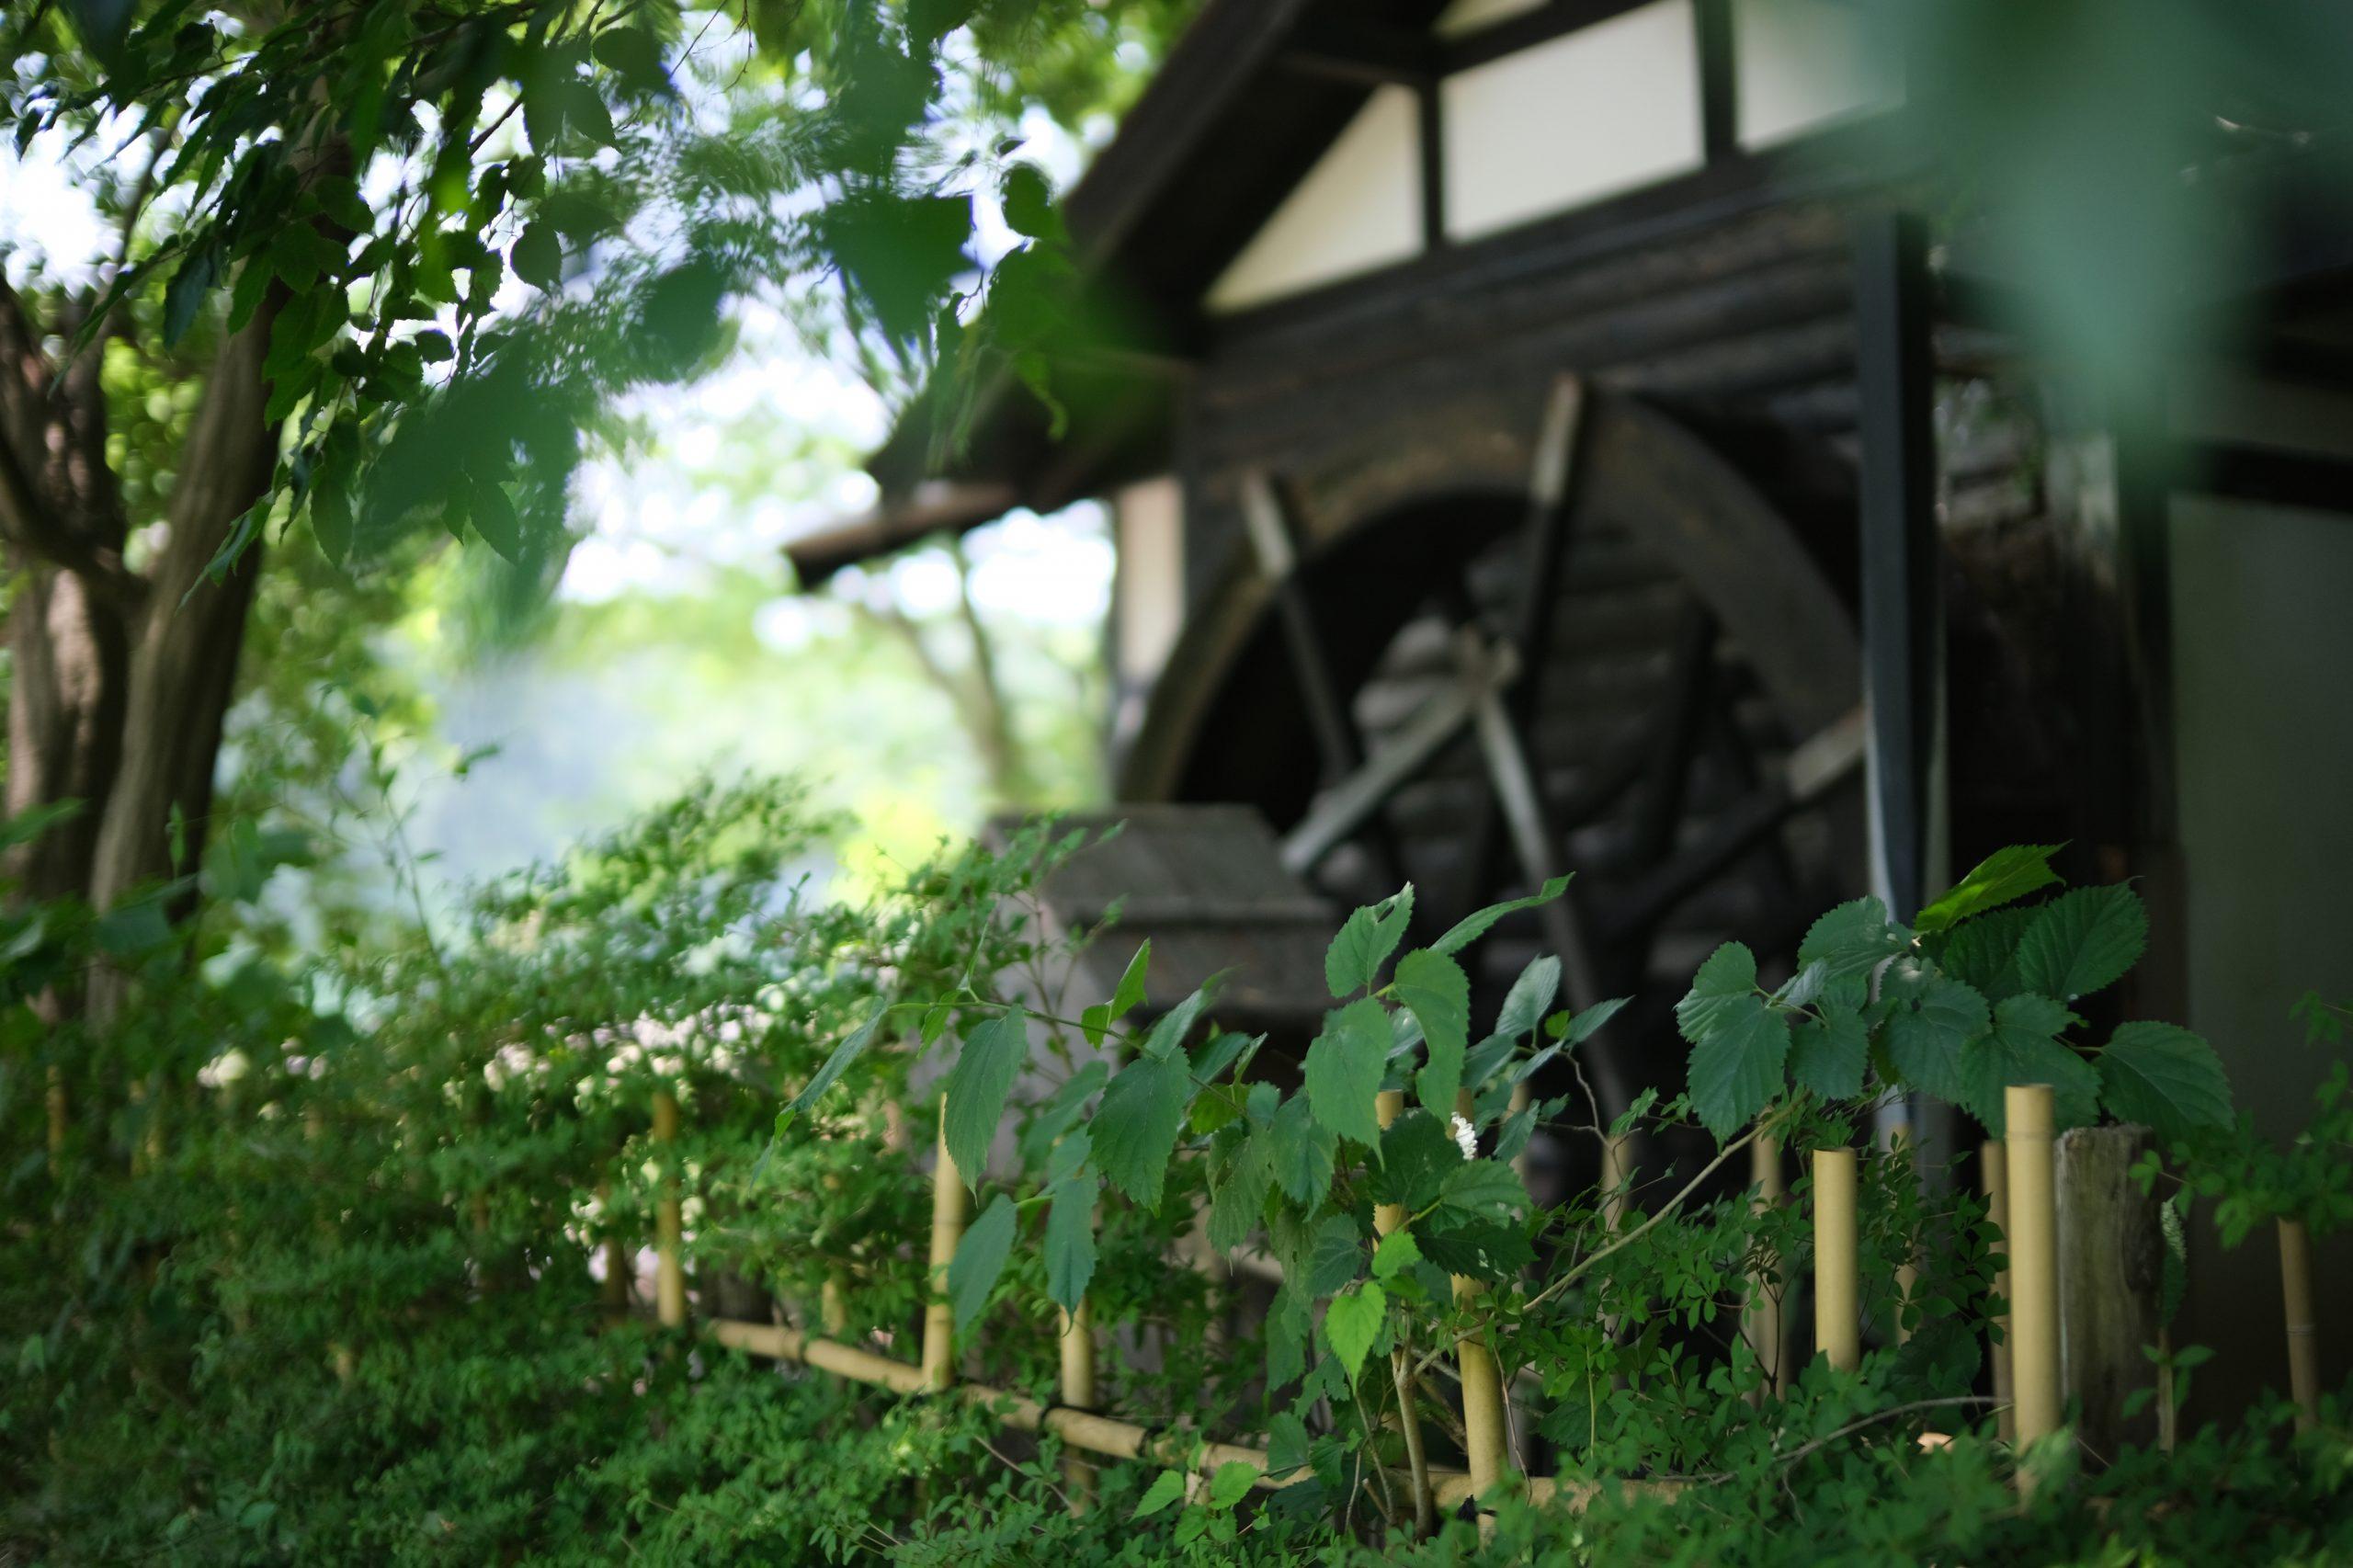 【FUJIFILM】大口径F0.95で田舎を撮る